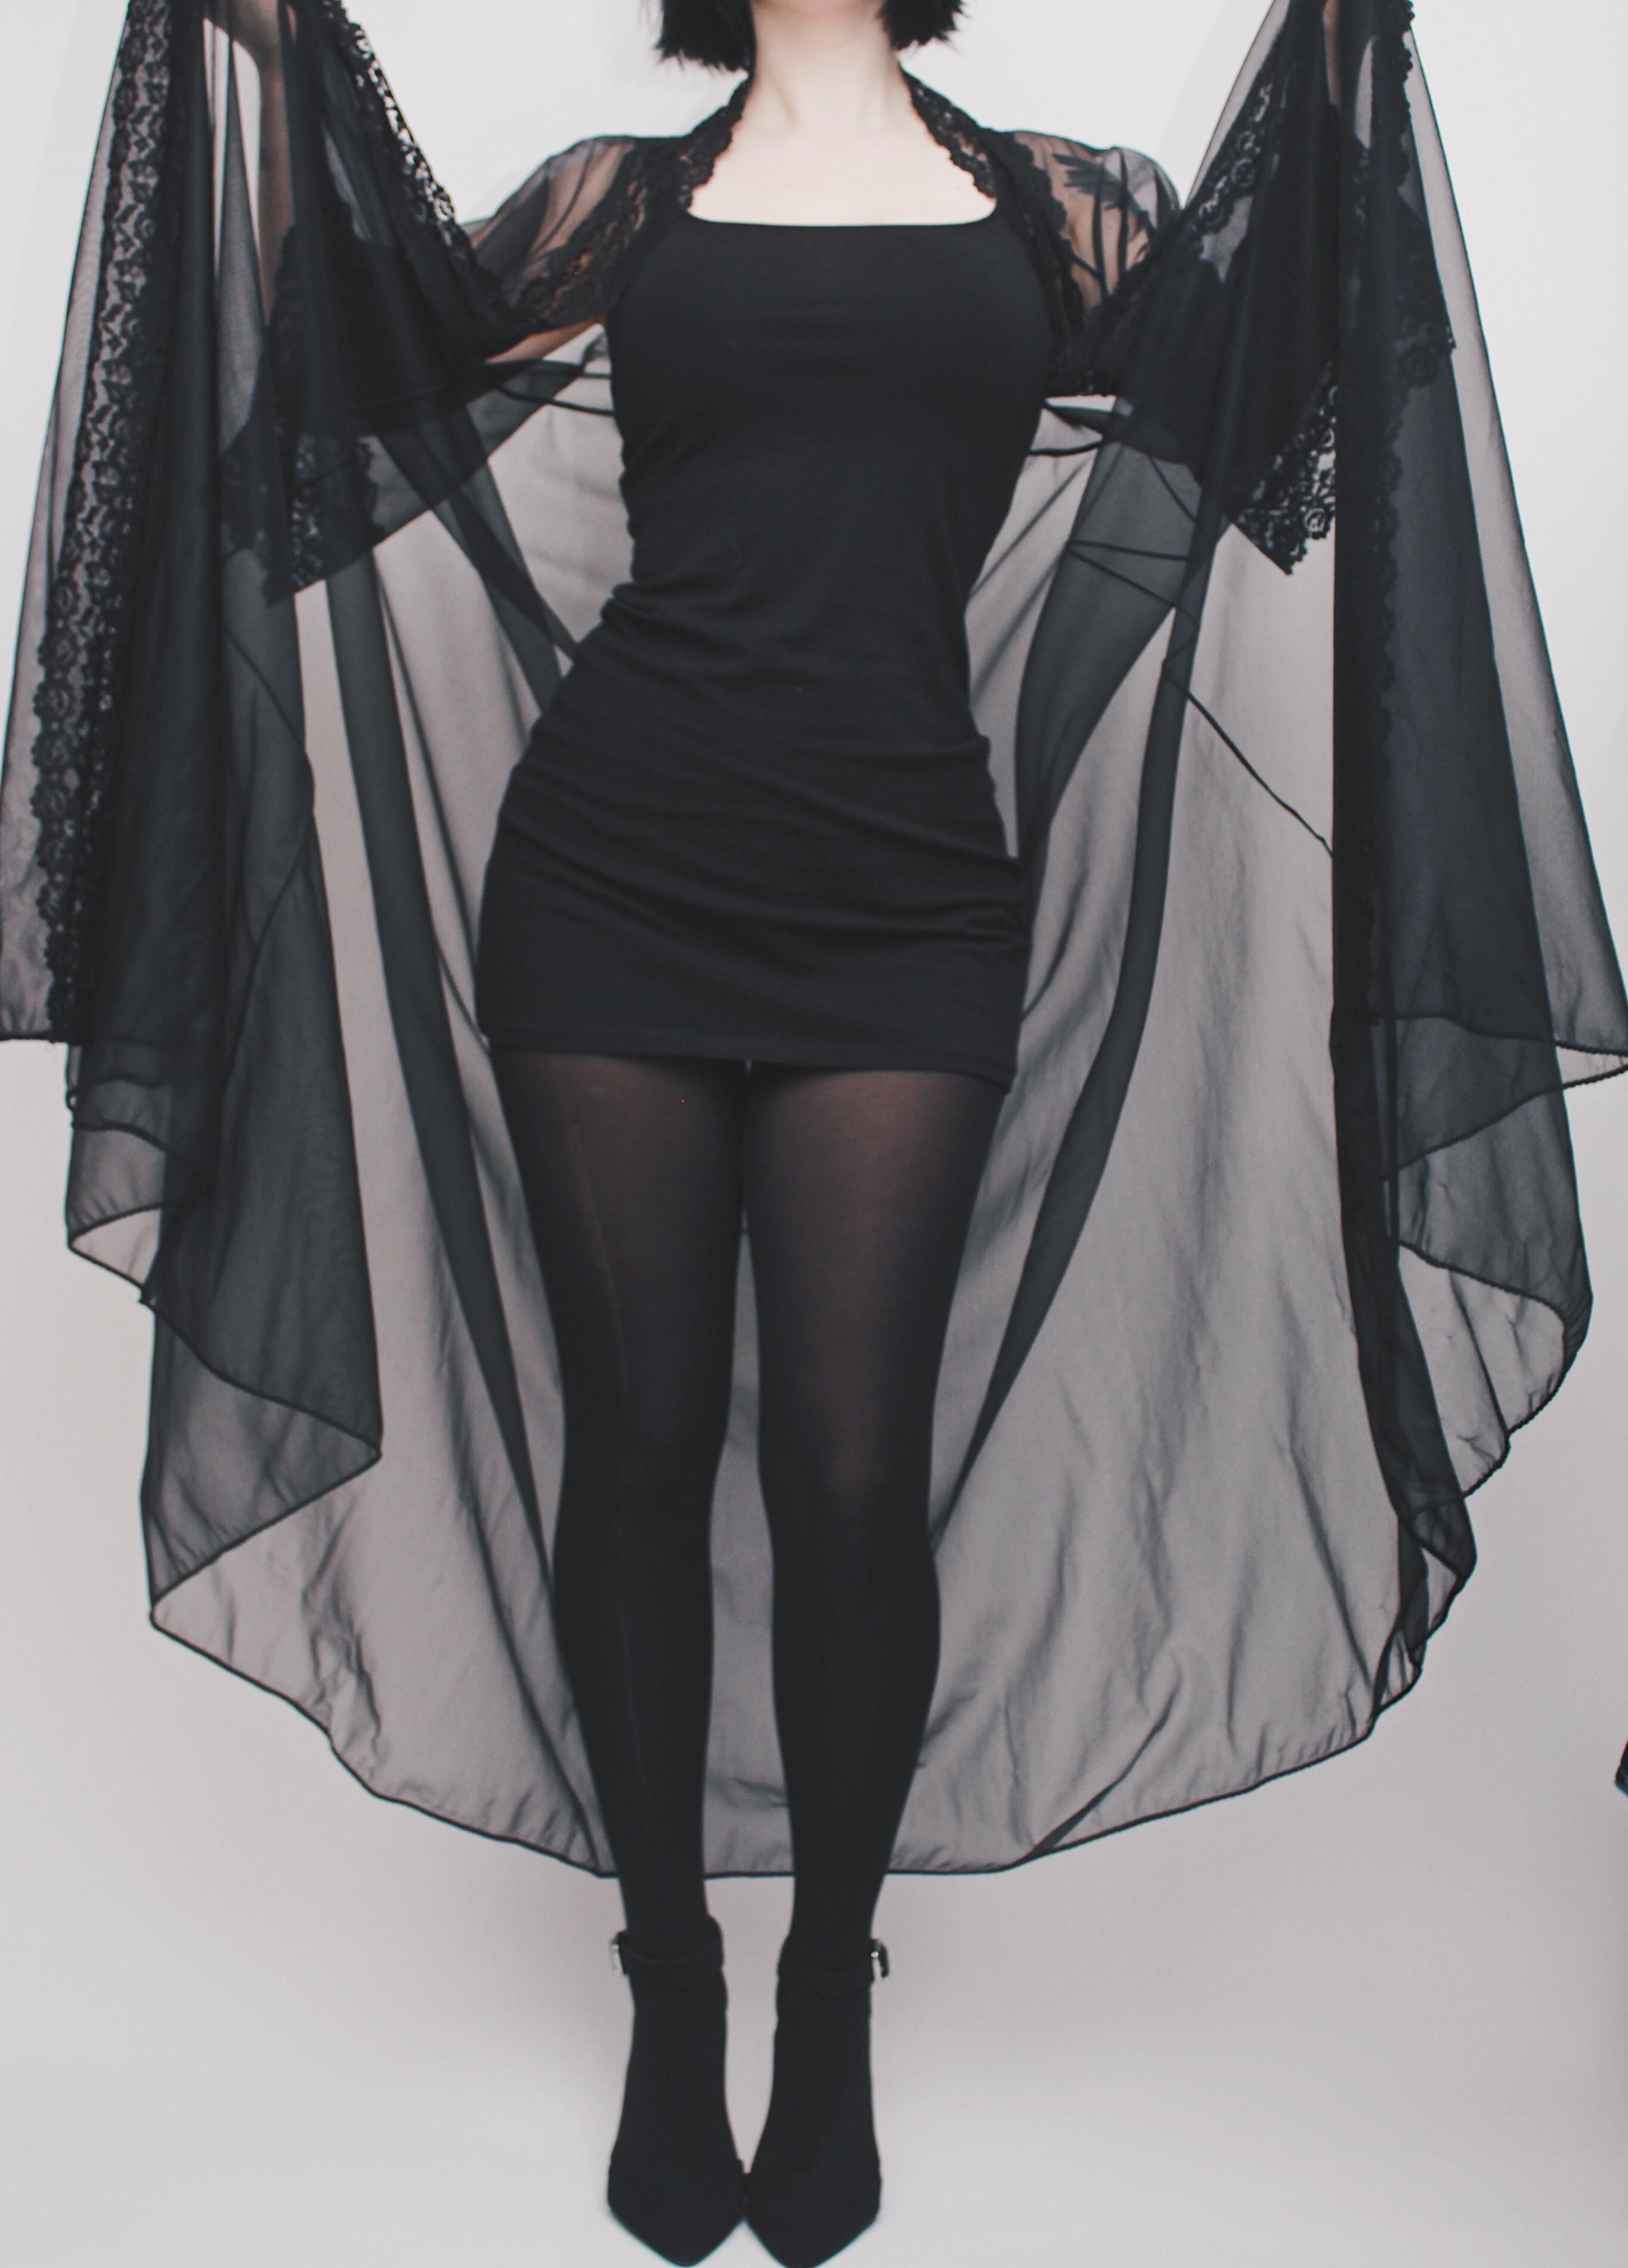 CLAIMED @aphonia - Vintage 1965 Sheer Black Bell Sleeve Dressing ...